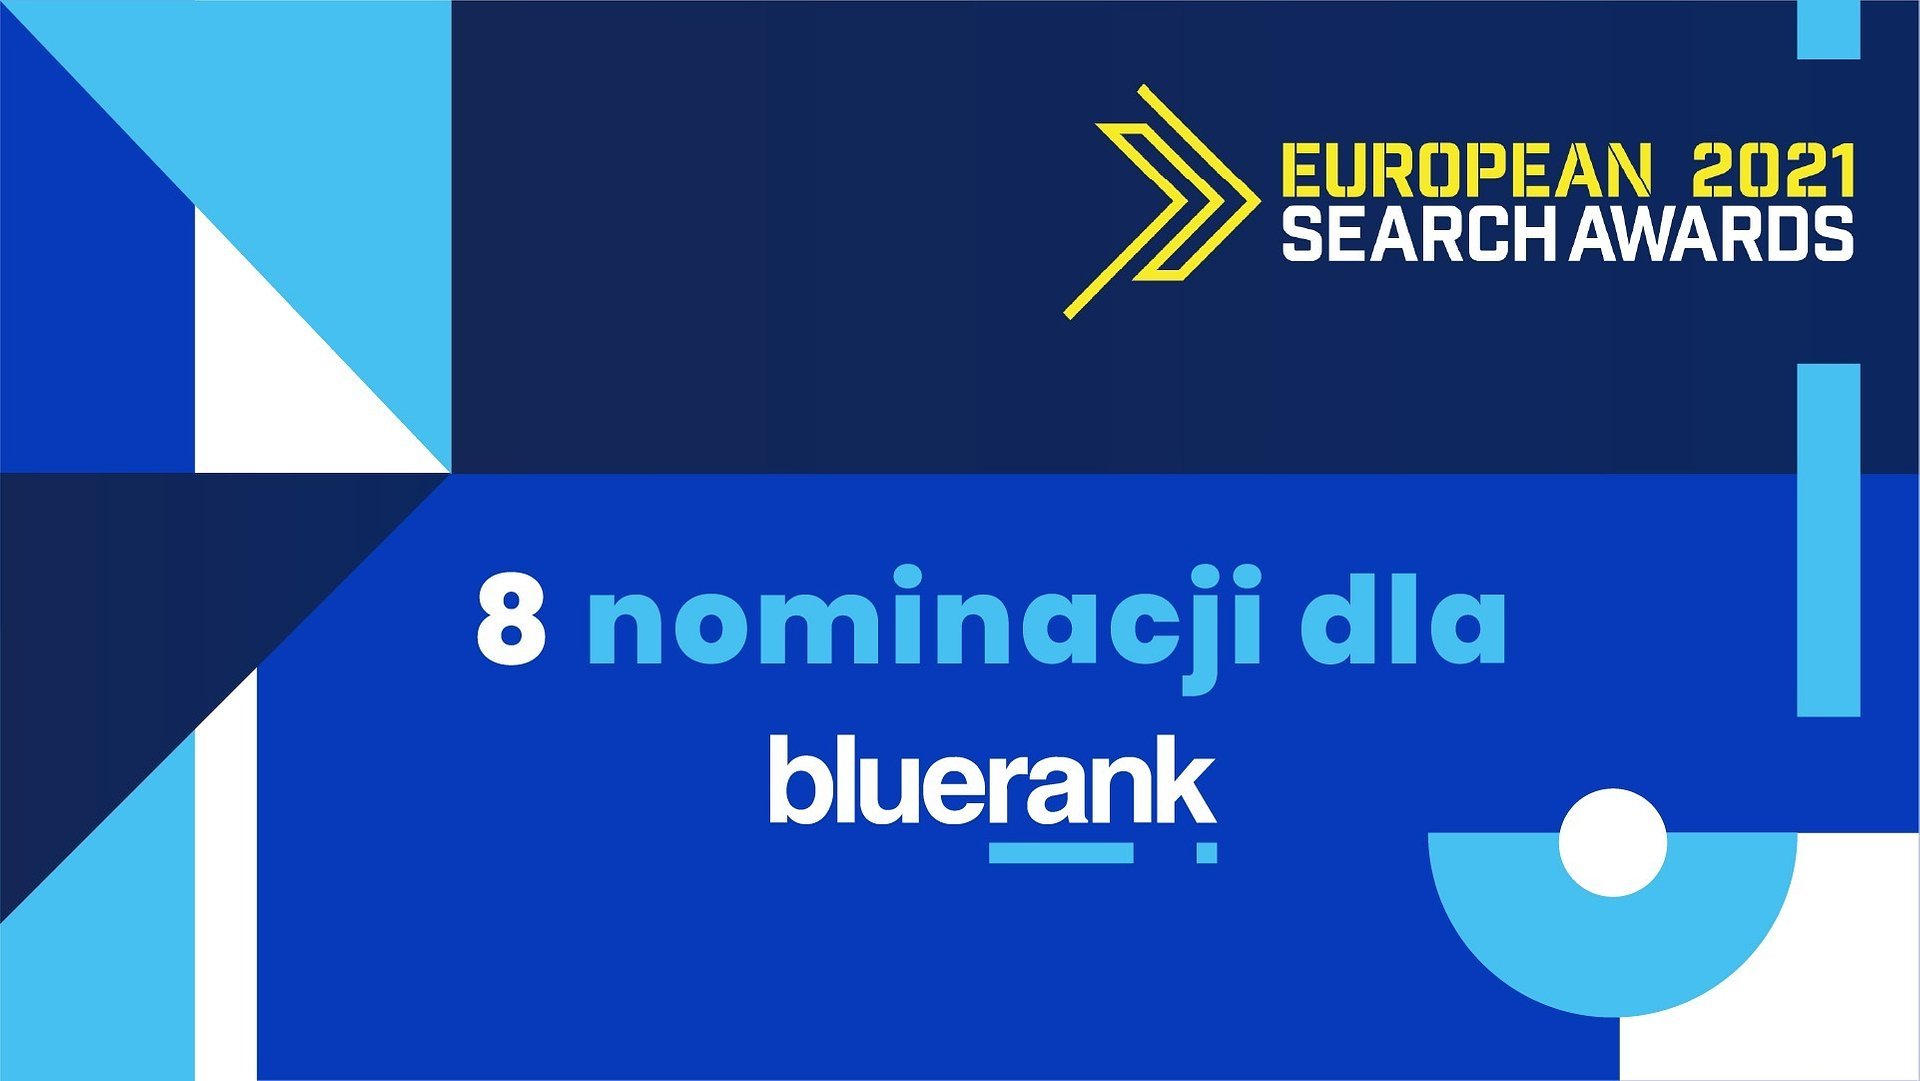 Bluerank z ośmioma nominacjami ESA!